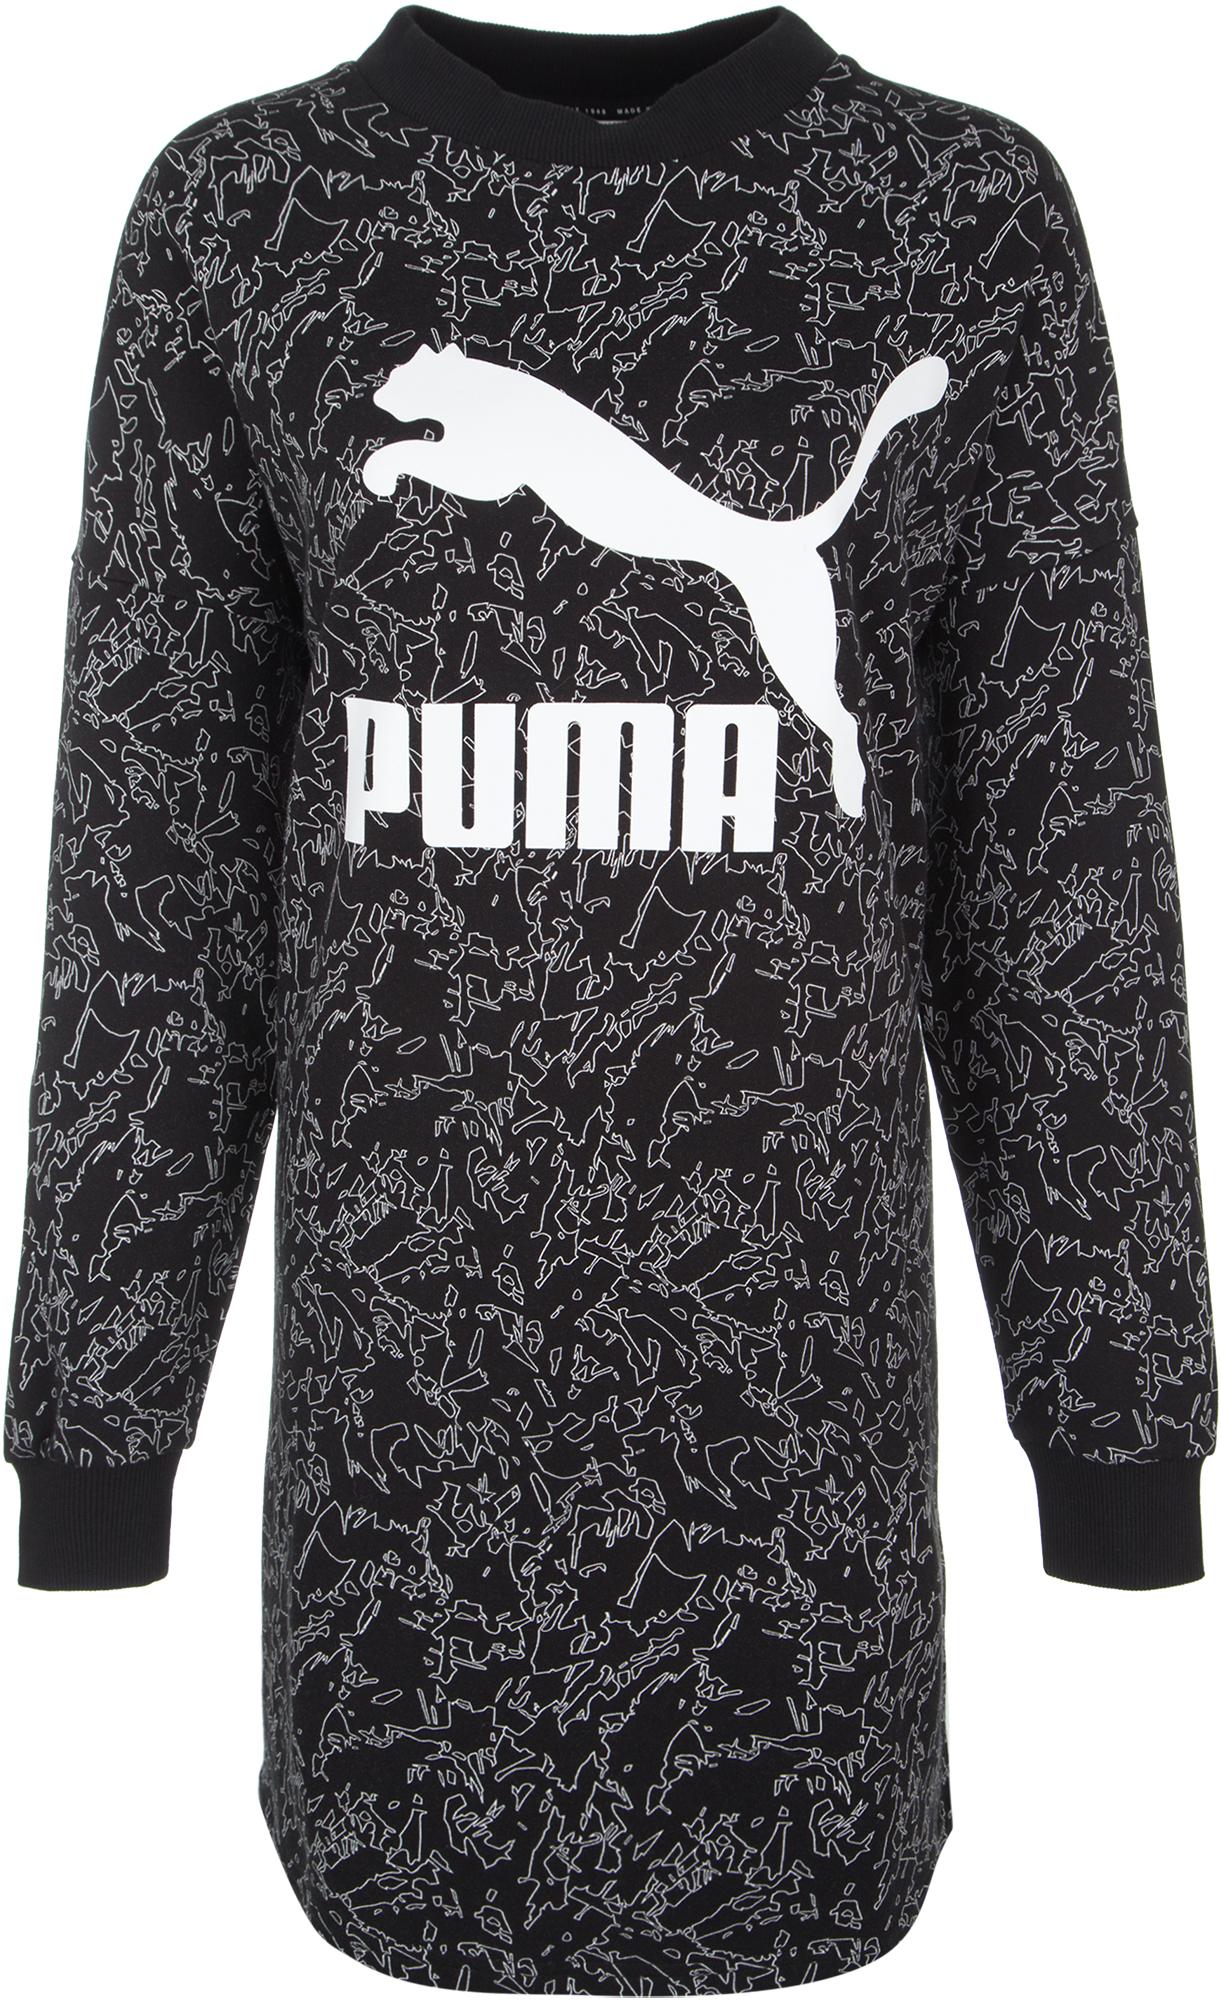 Puma Платье женское Puma Classic, размер 46-48 женское платье quality of national splendor zs14l1155 2015